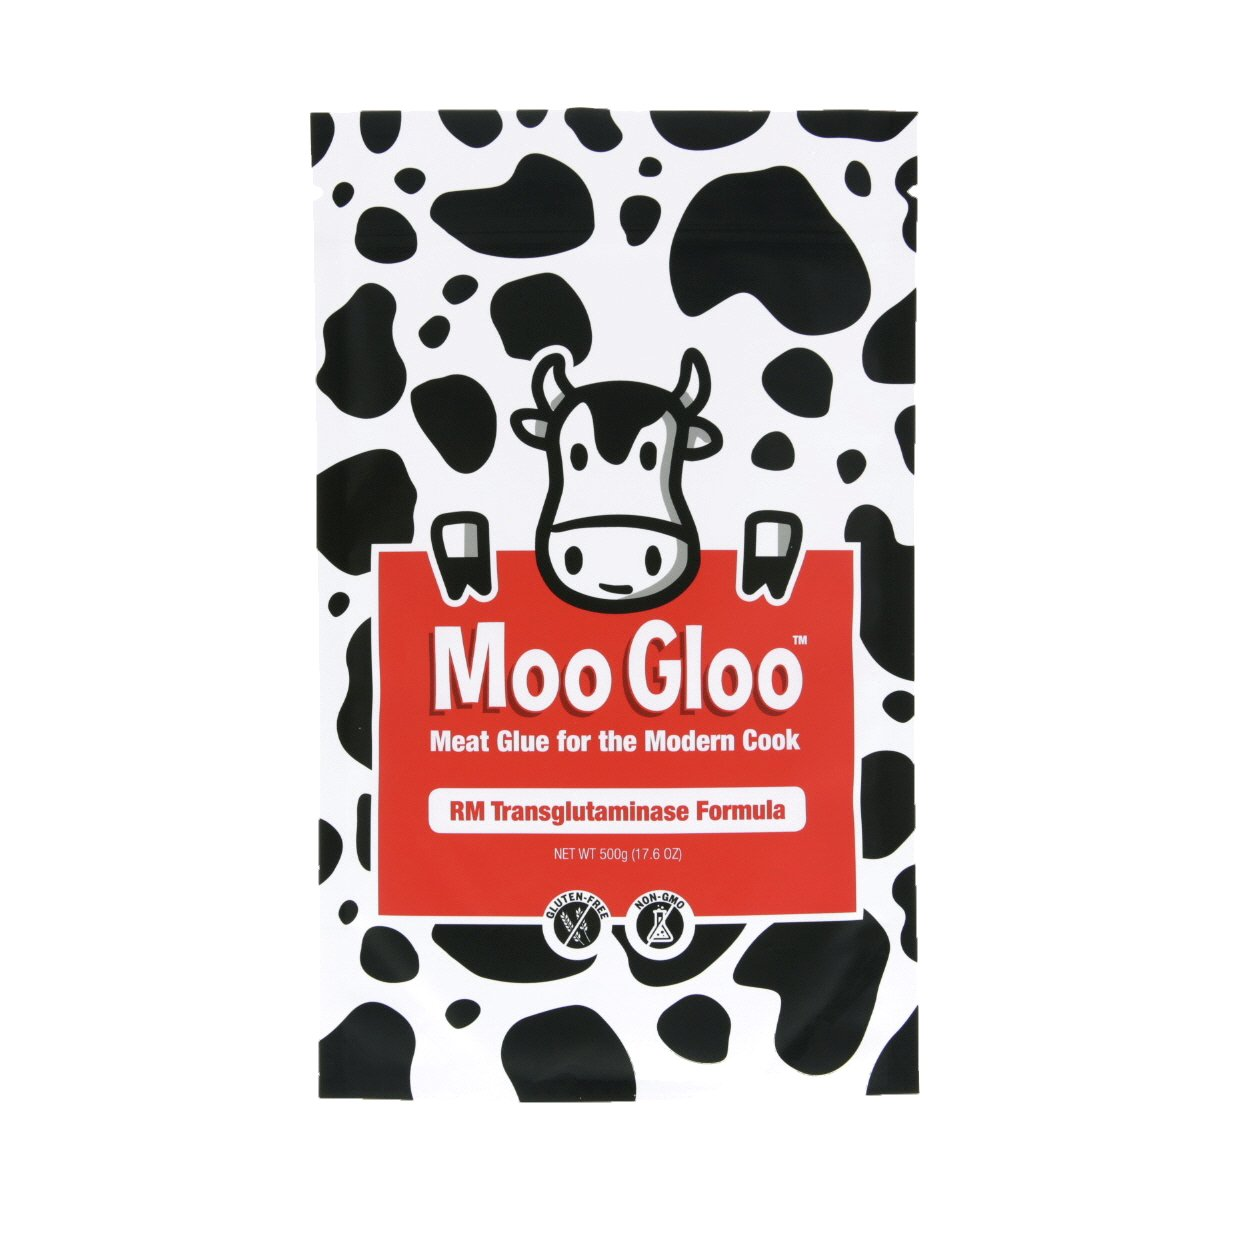 Transglutaminase (Meat Glue) - RM Formula, 500g/1.1lbs by Moo Gloo